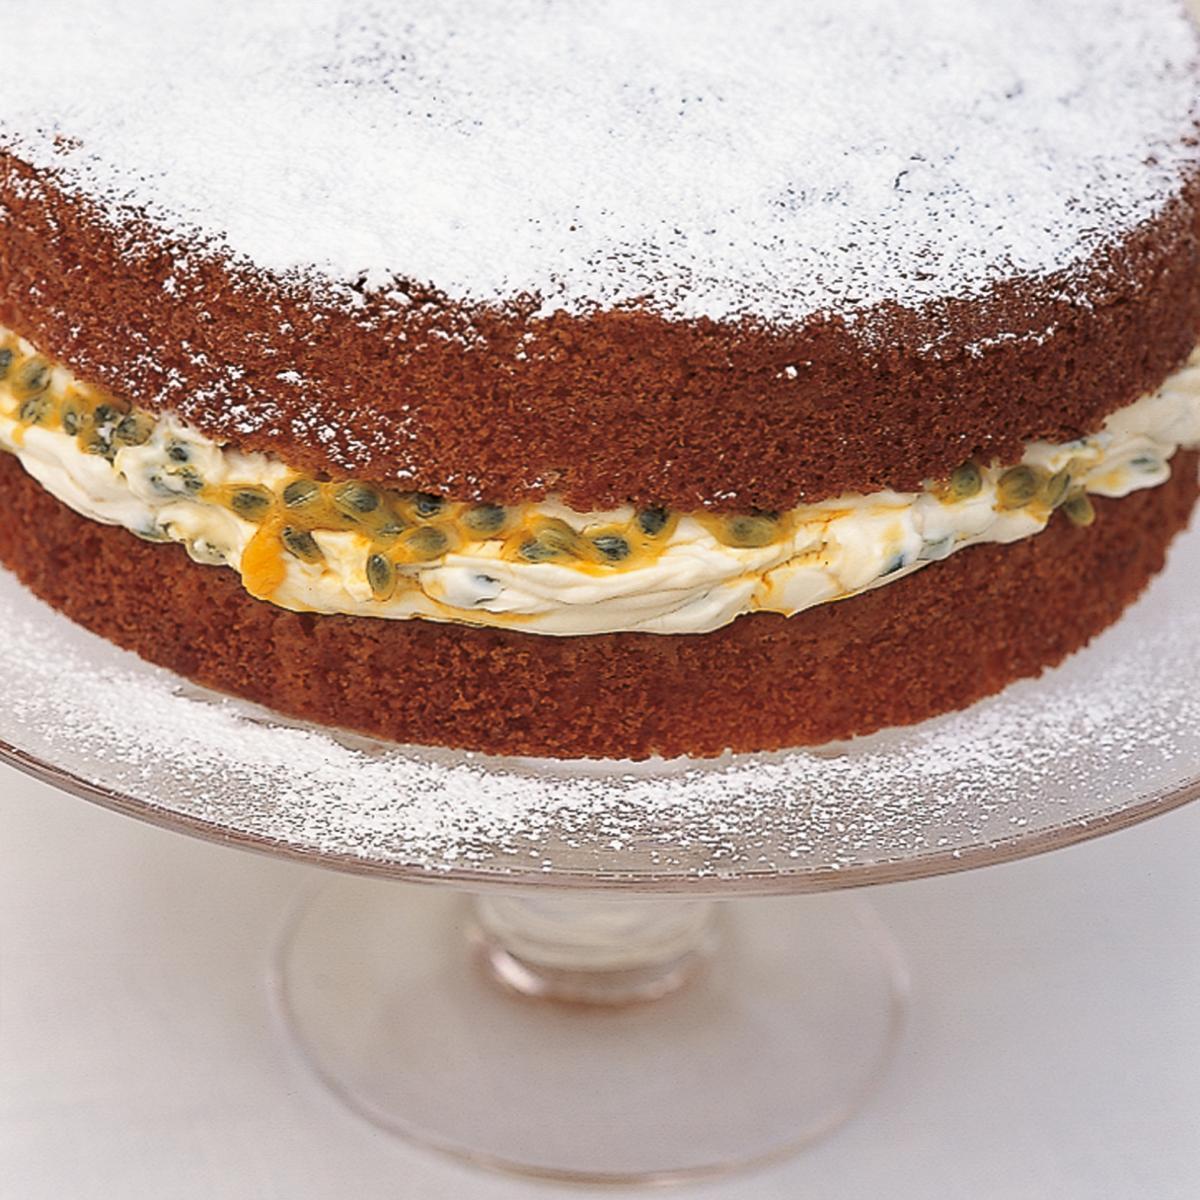 resimli tarif: lemon cake recipe delia smith [10]